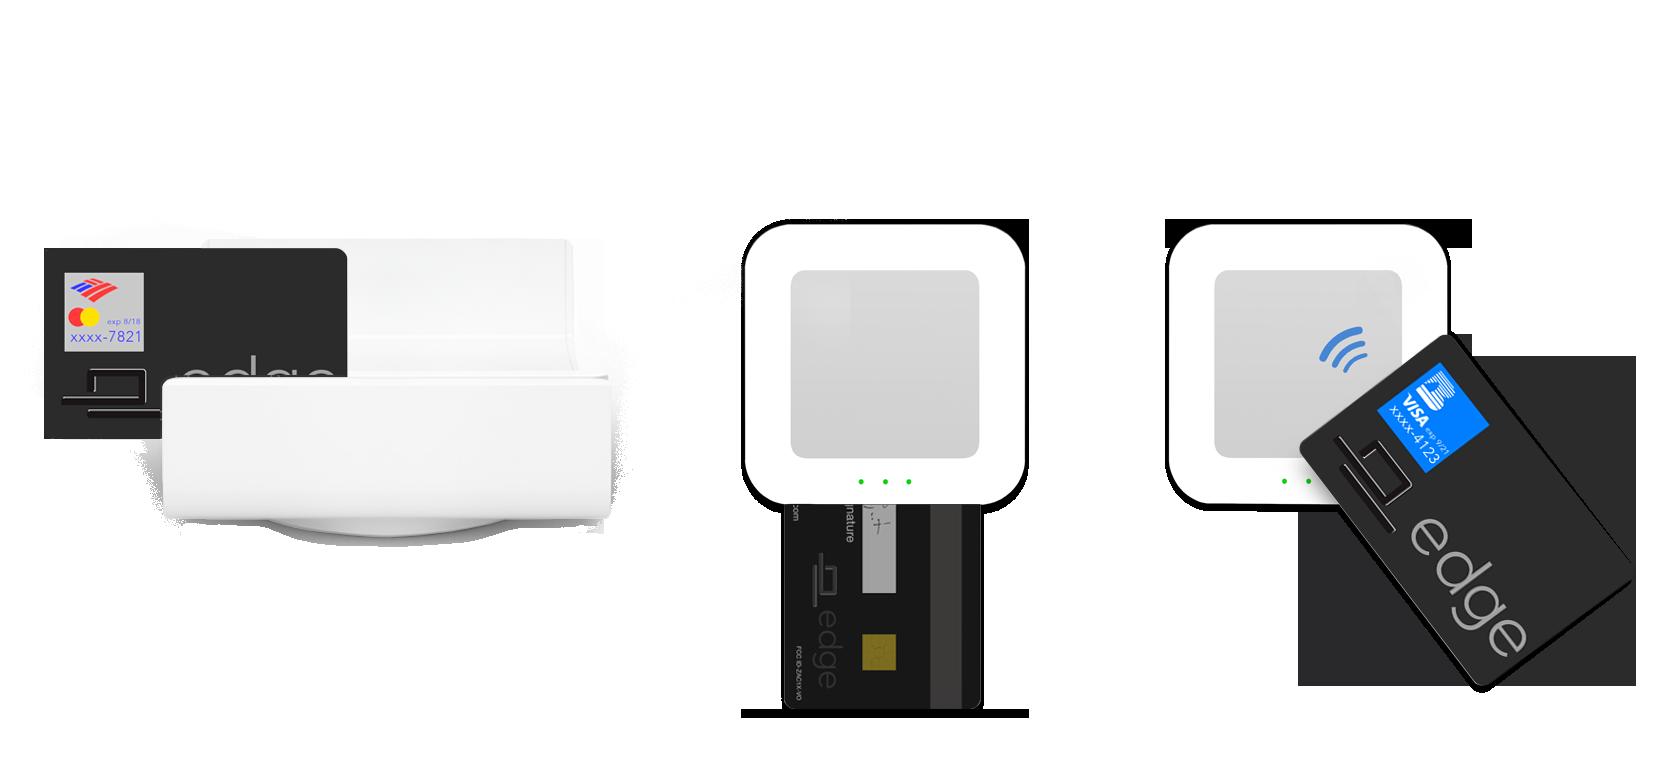 Edge Card Magstripe-EMV-NFC 2018.png